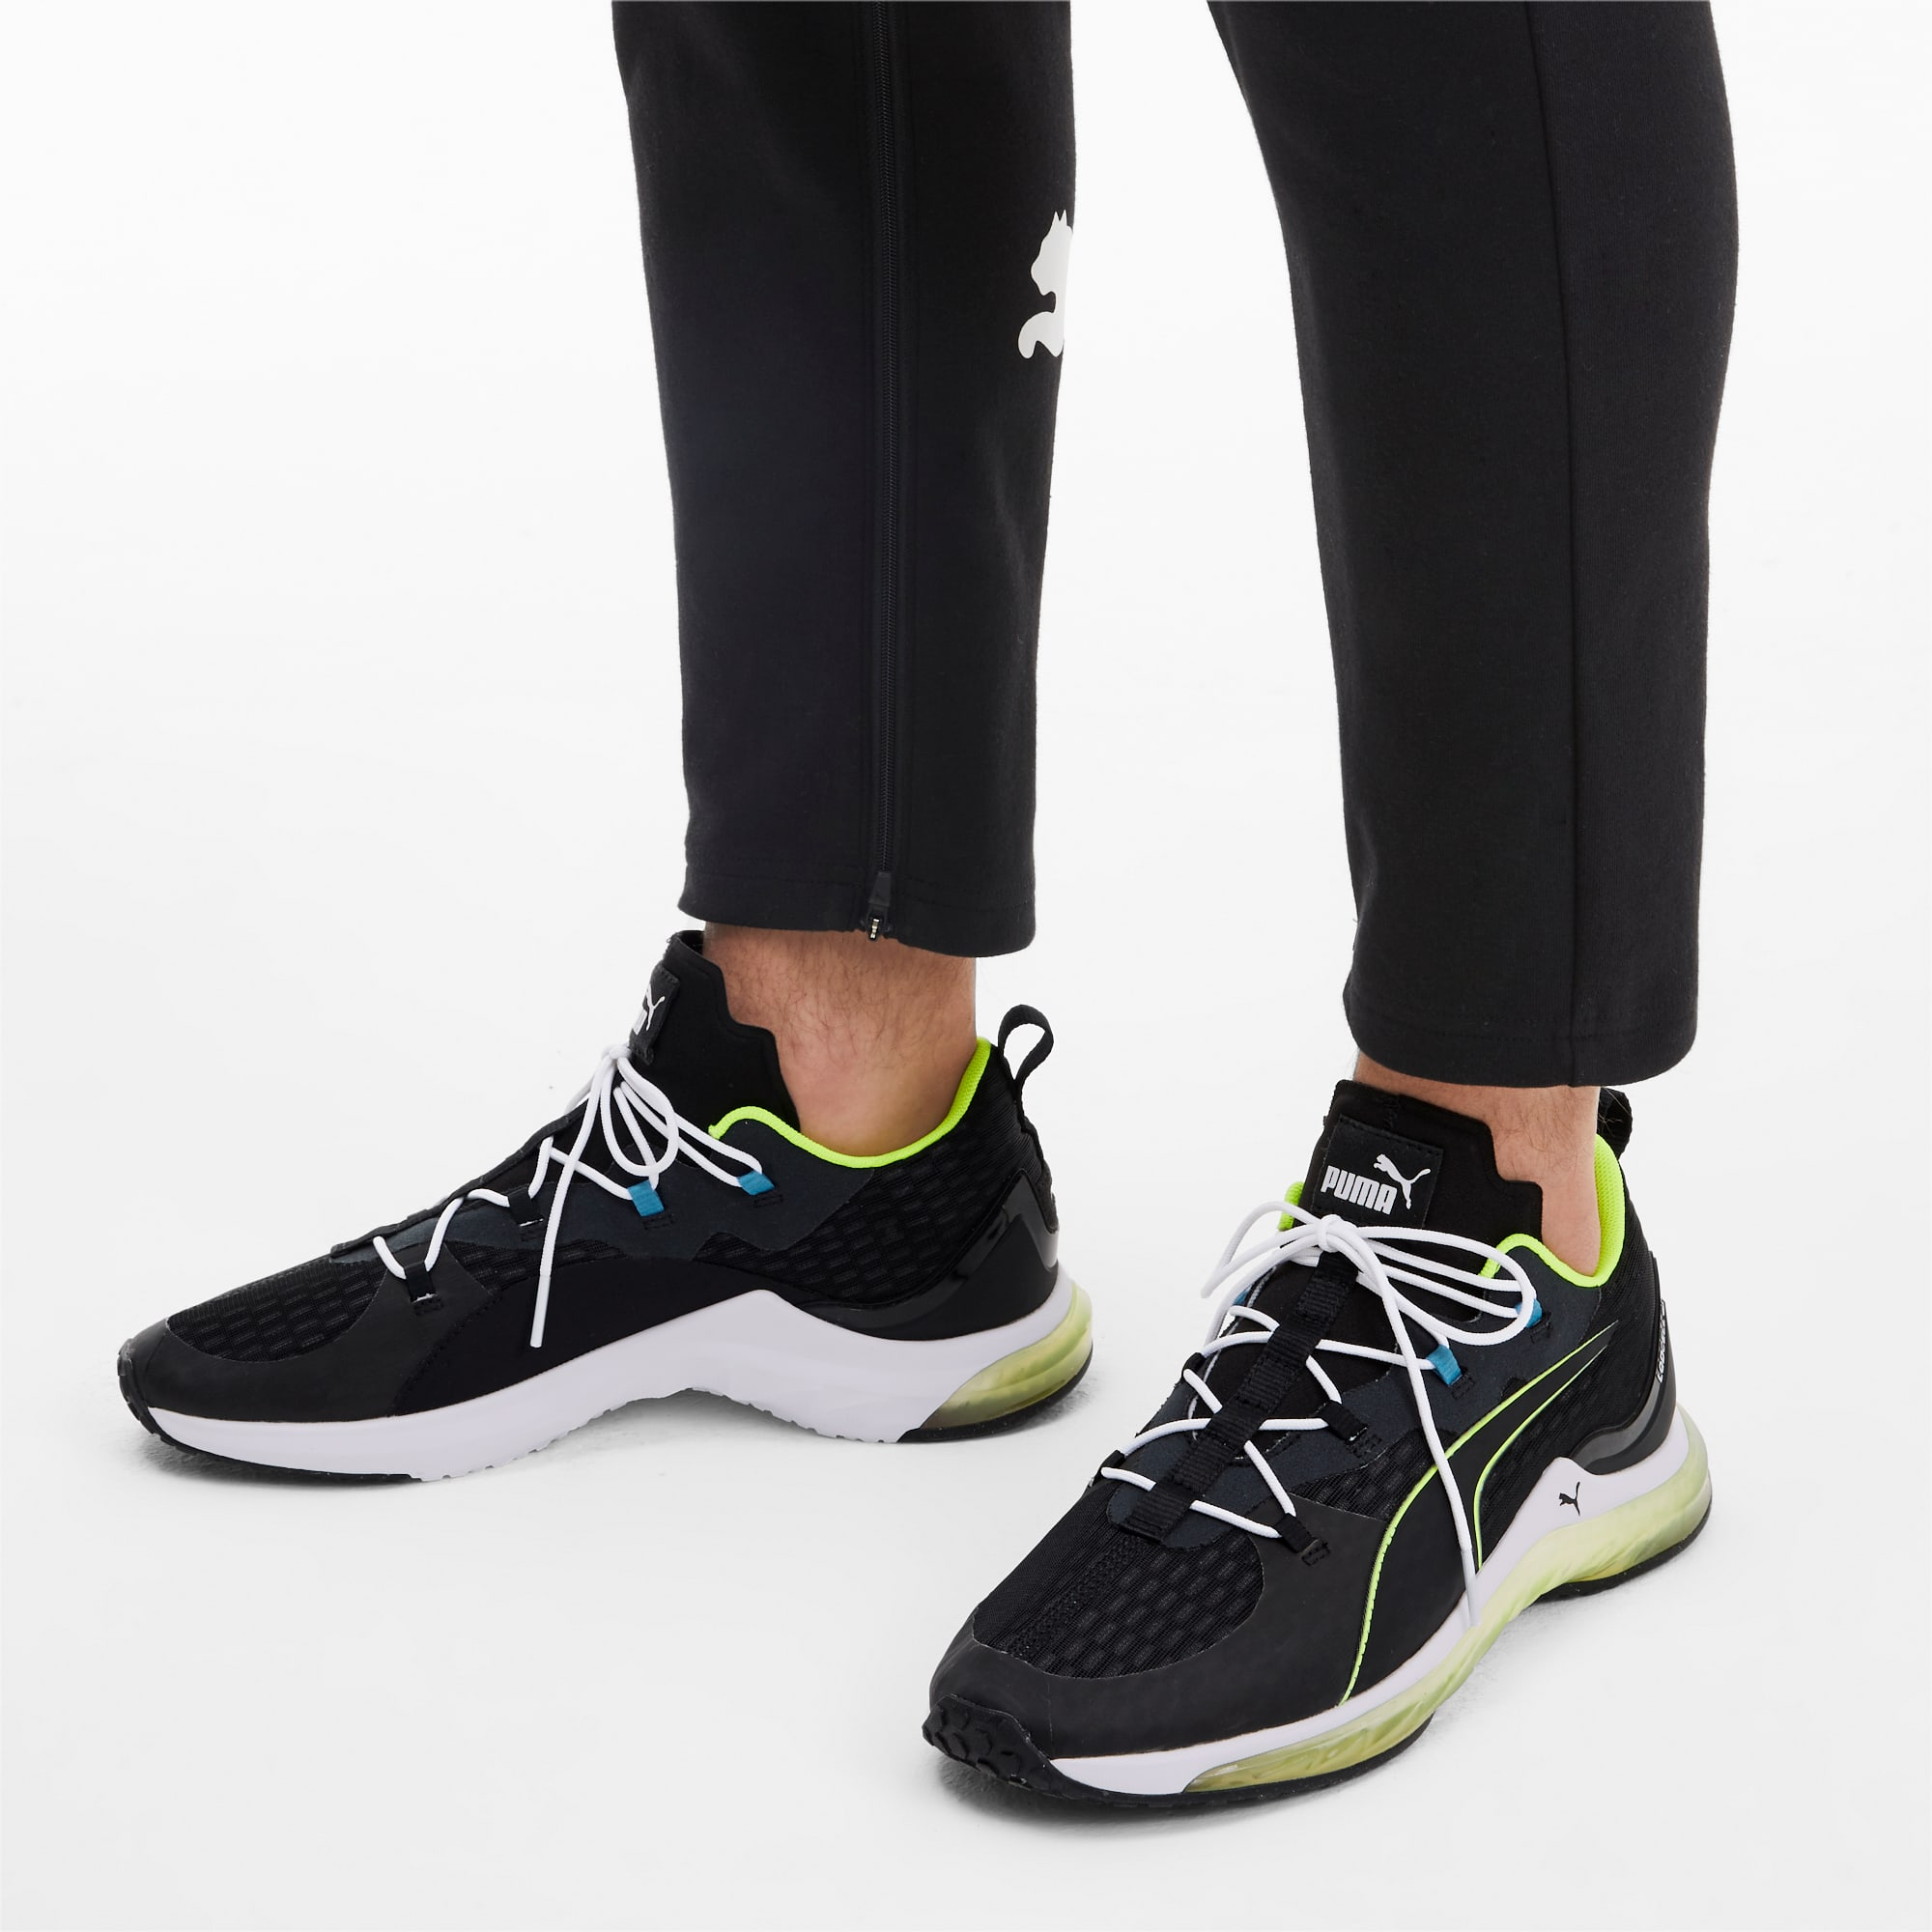 LQDCELL Hydra Men's Training Shoes